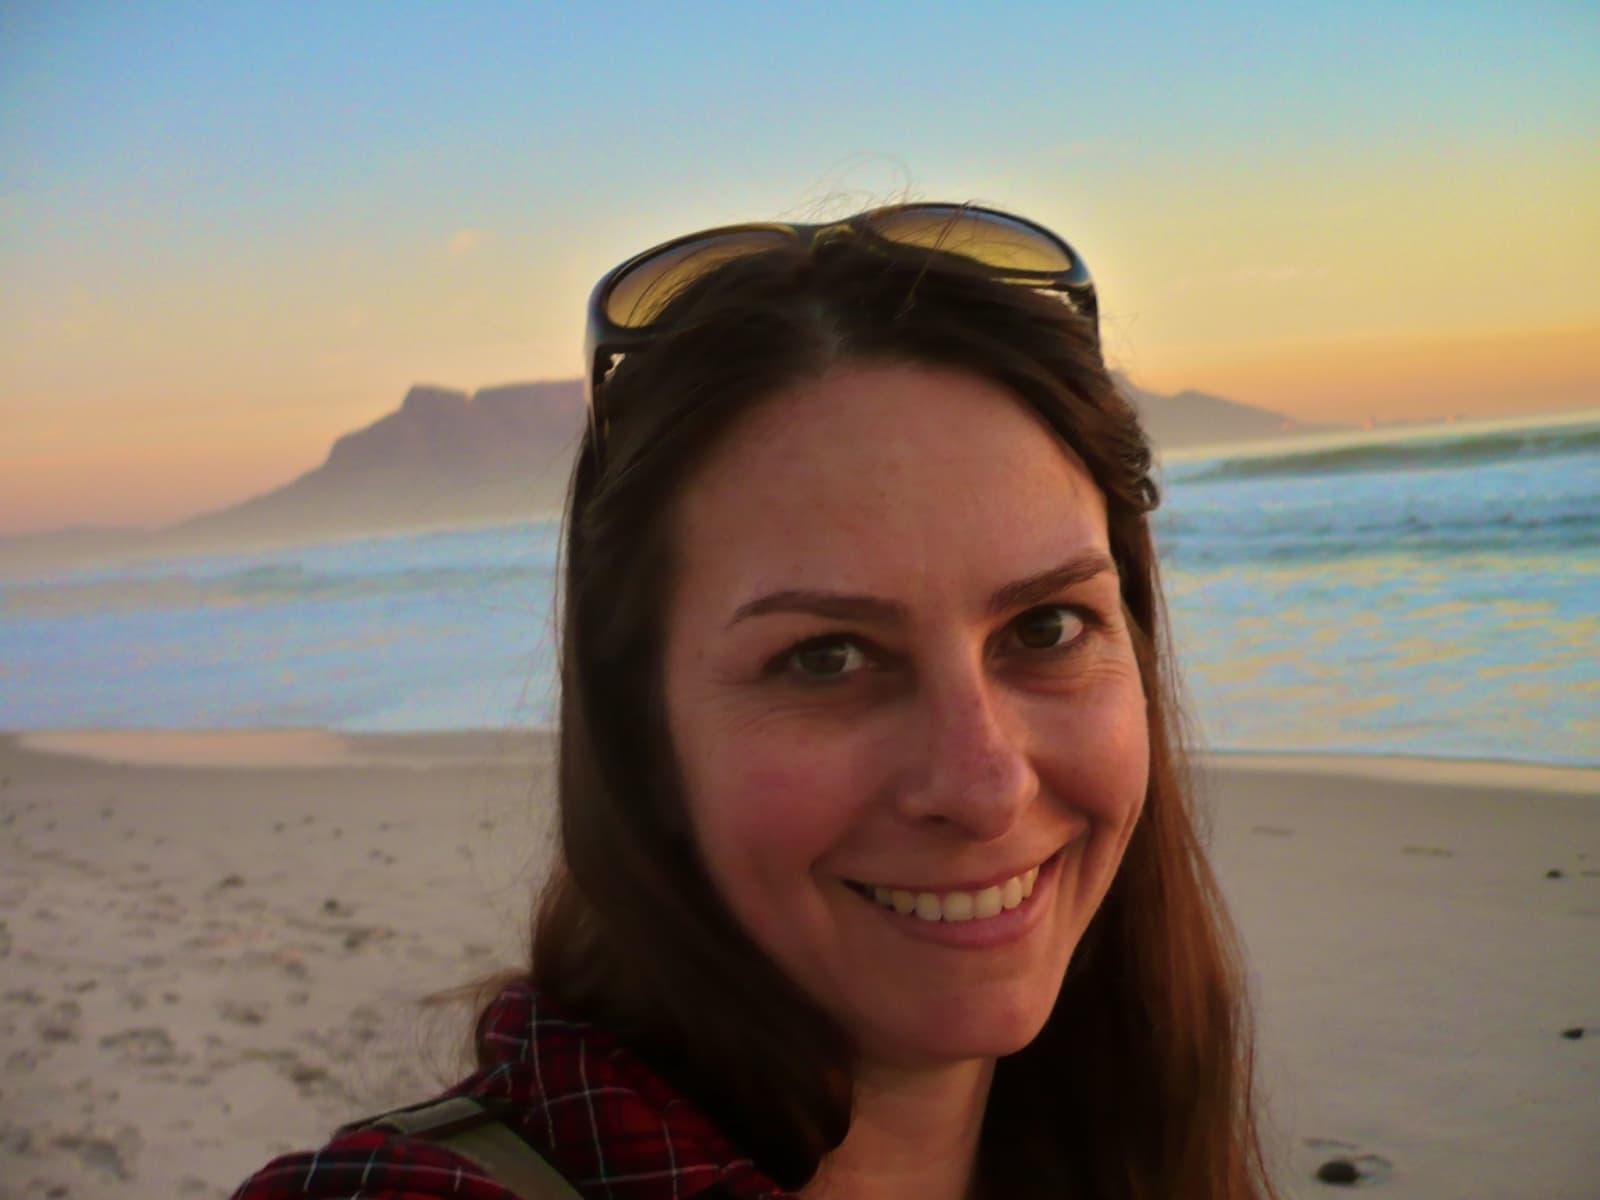 Katharina from Los Angeles, California, United States